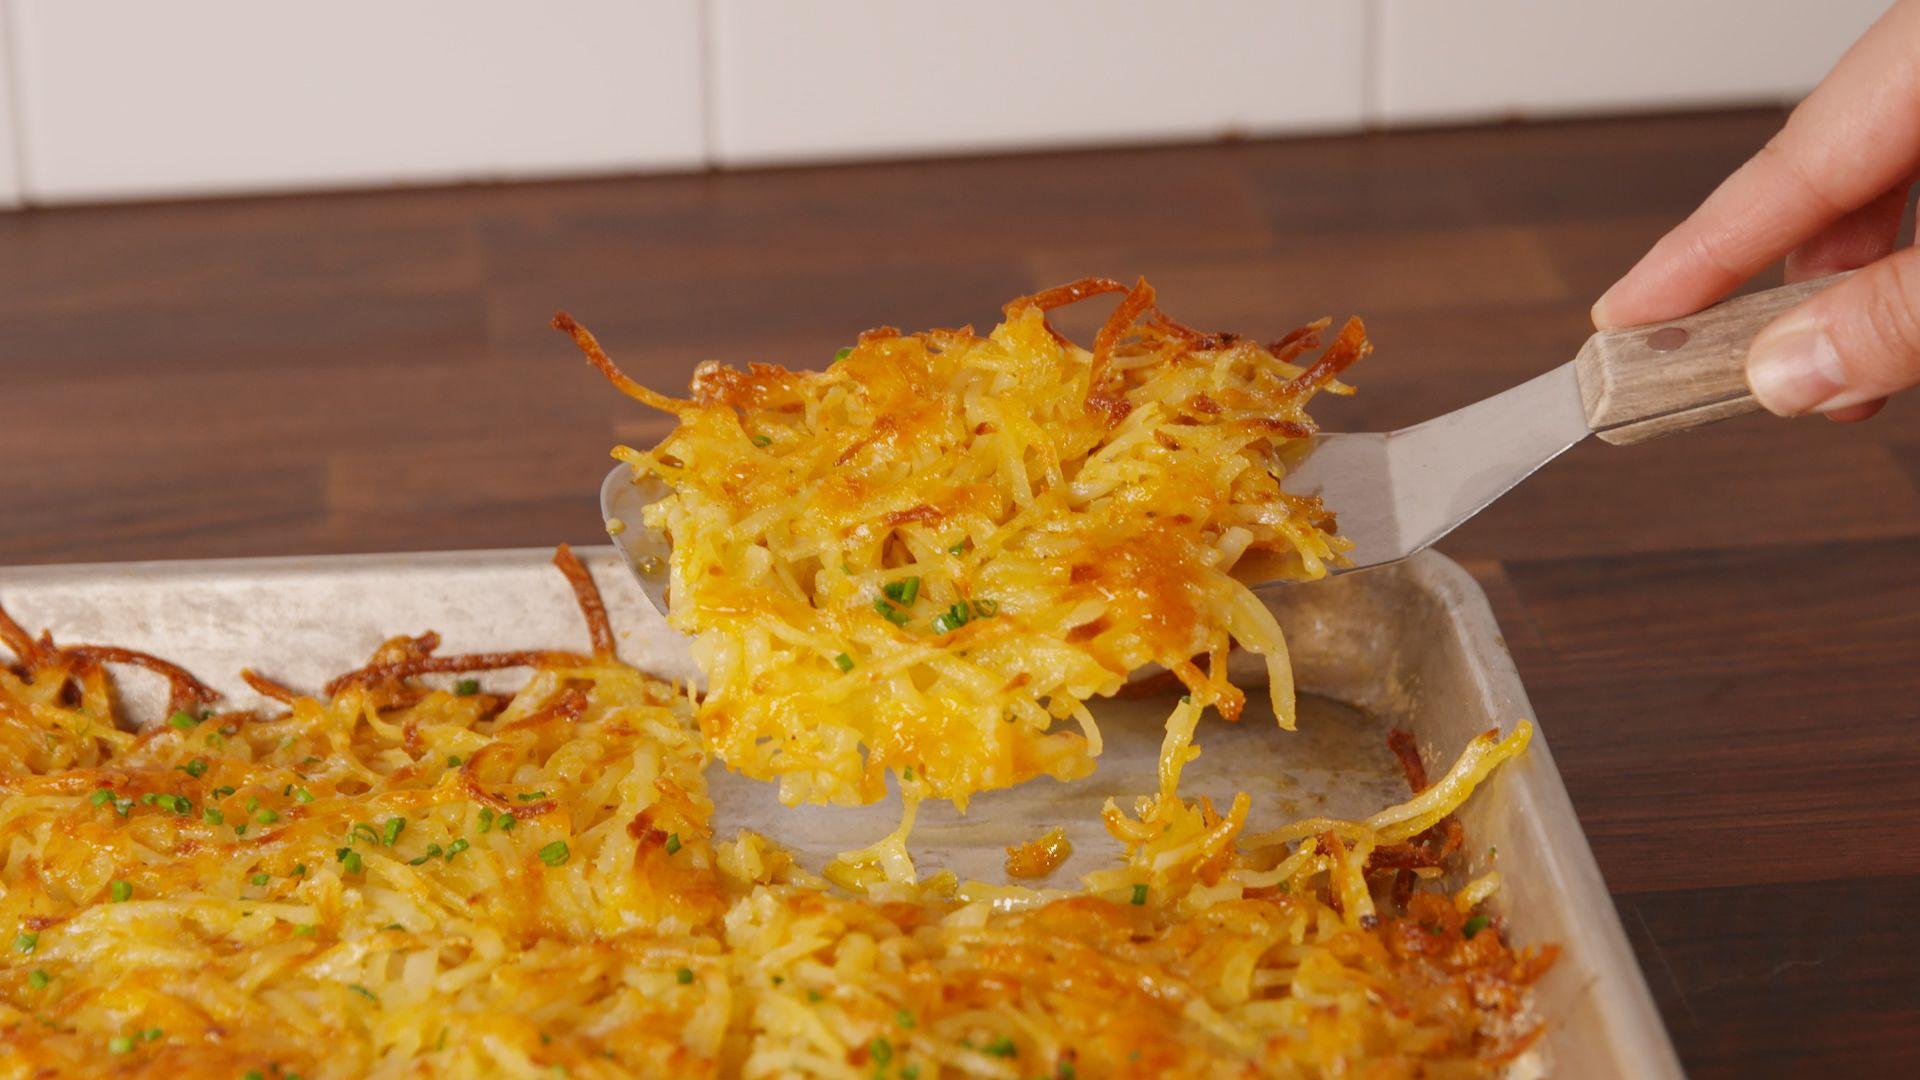 How to make crispy pan fried hash browns